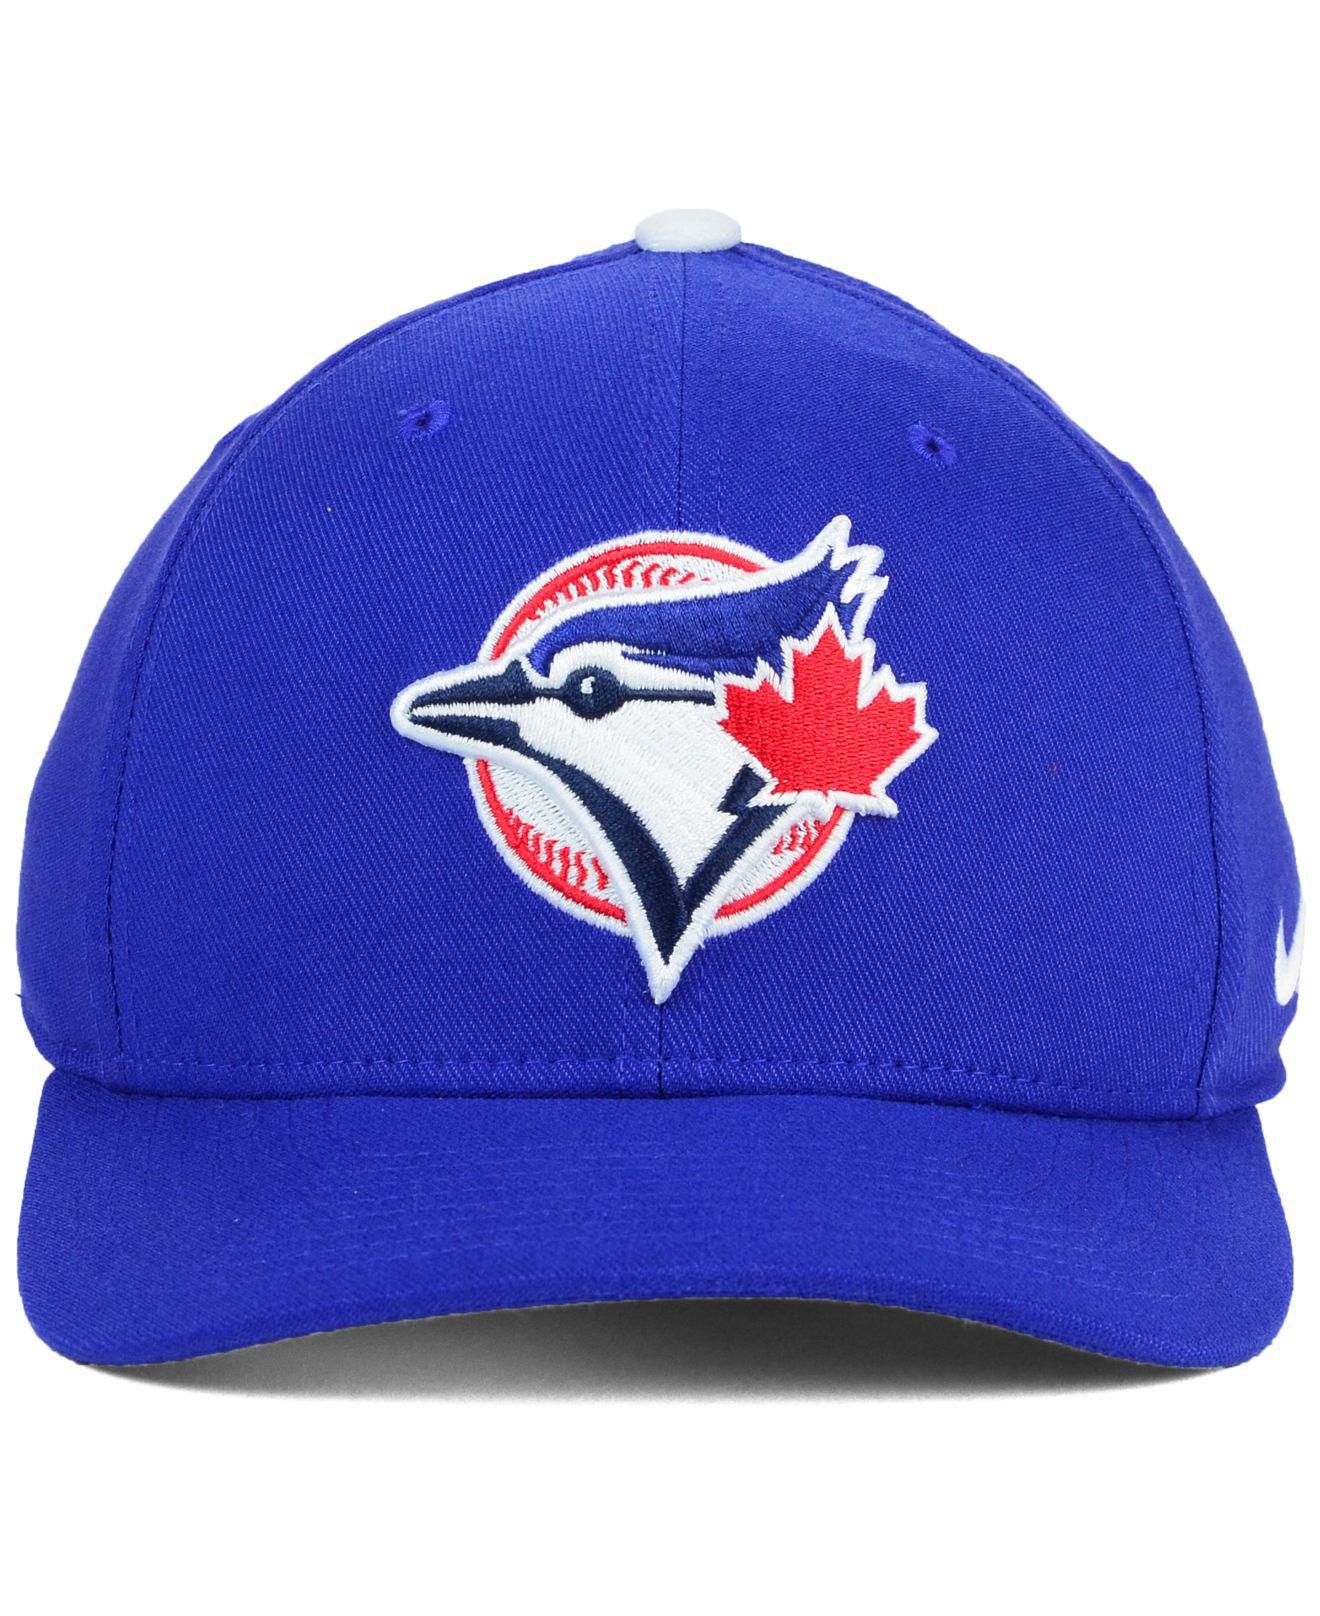 fab5b0284fc Lyst - Nike Toronto Blue Jays Classic Swooshflex Cap in Blue for Men